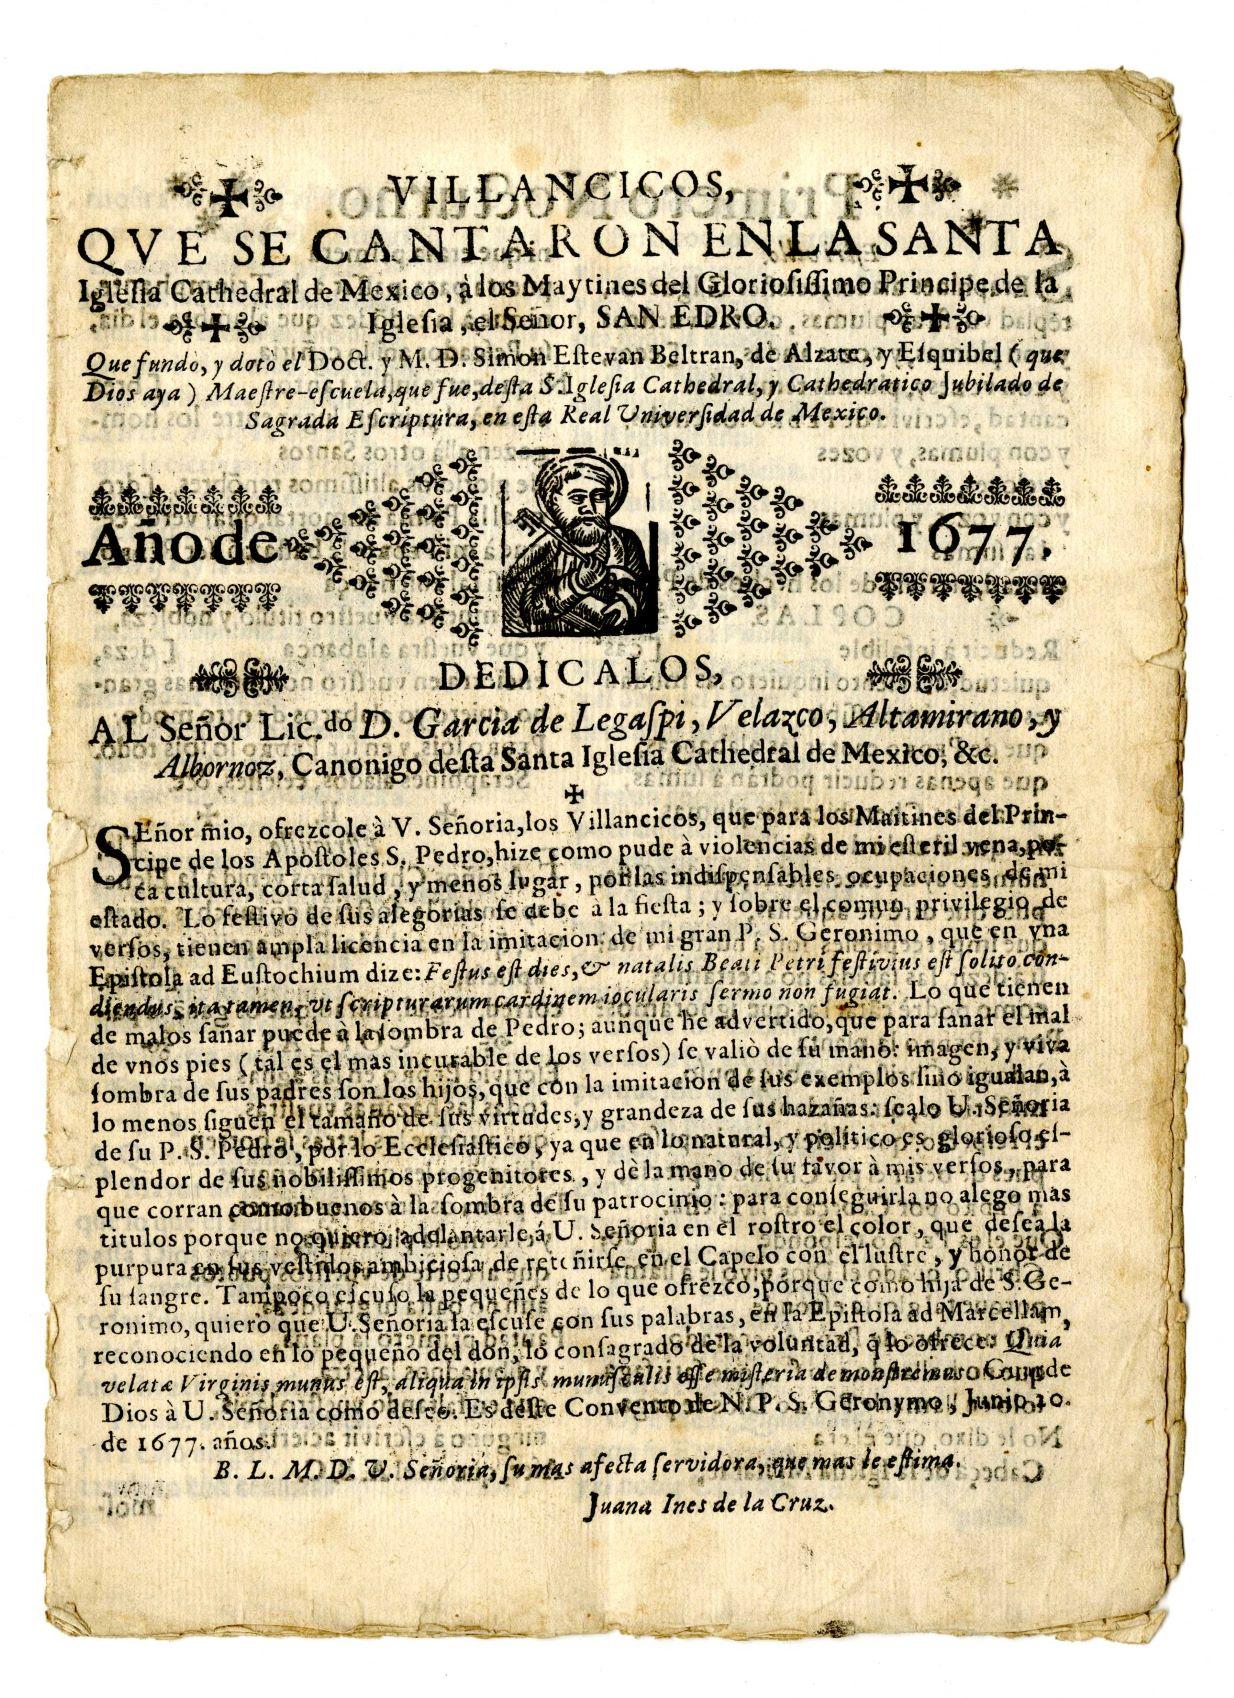 Image 5. Sor Juana Inés de la Cruz, villancicos (short religious songs) written in 1677 .